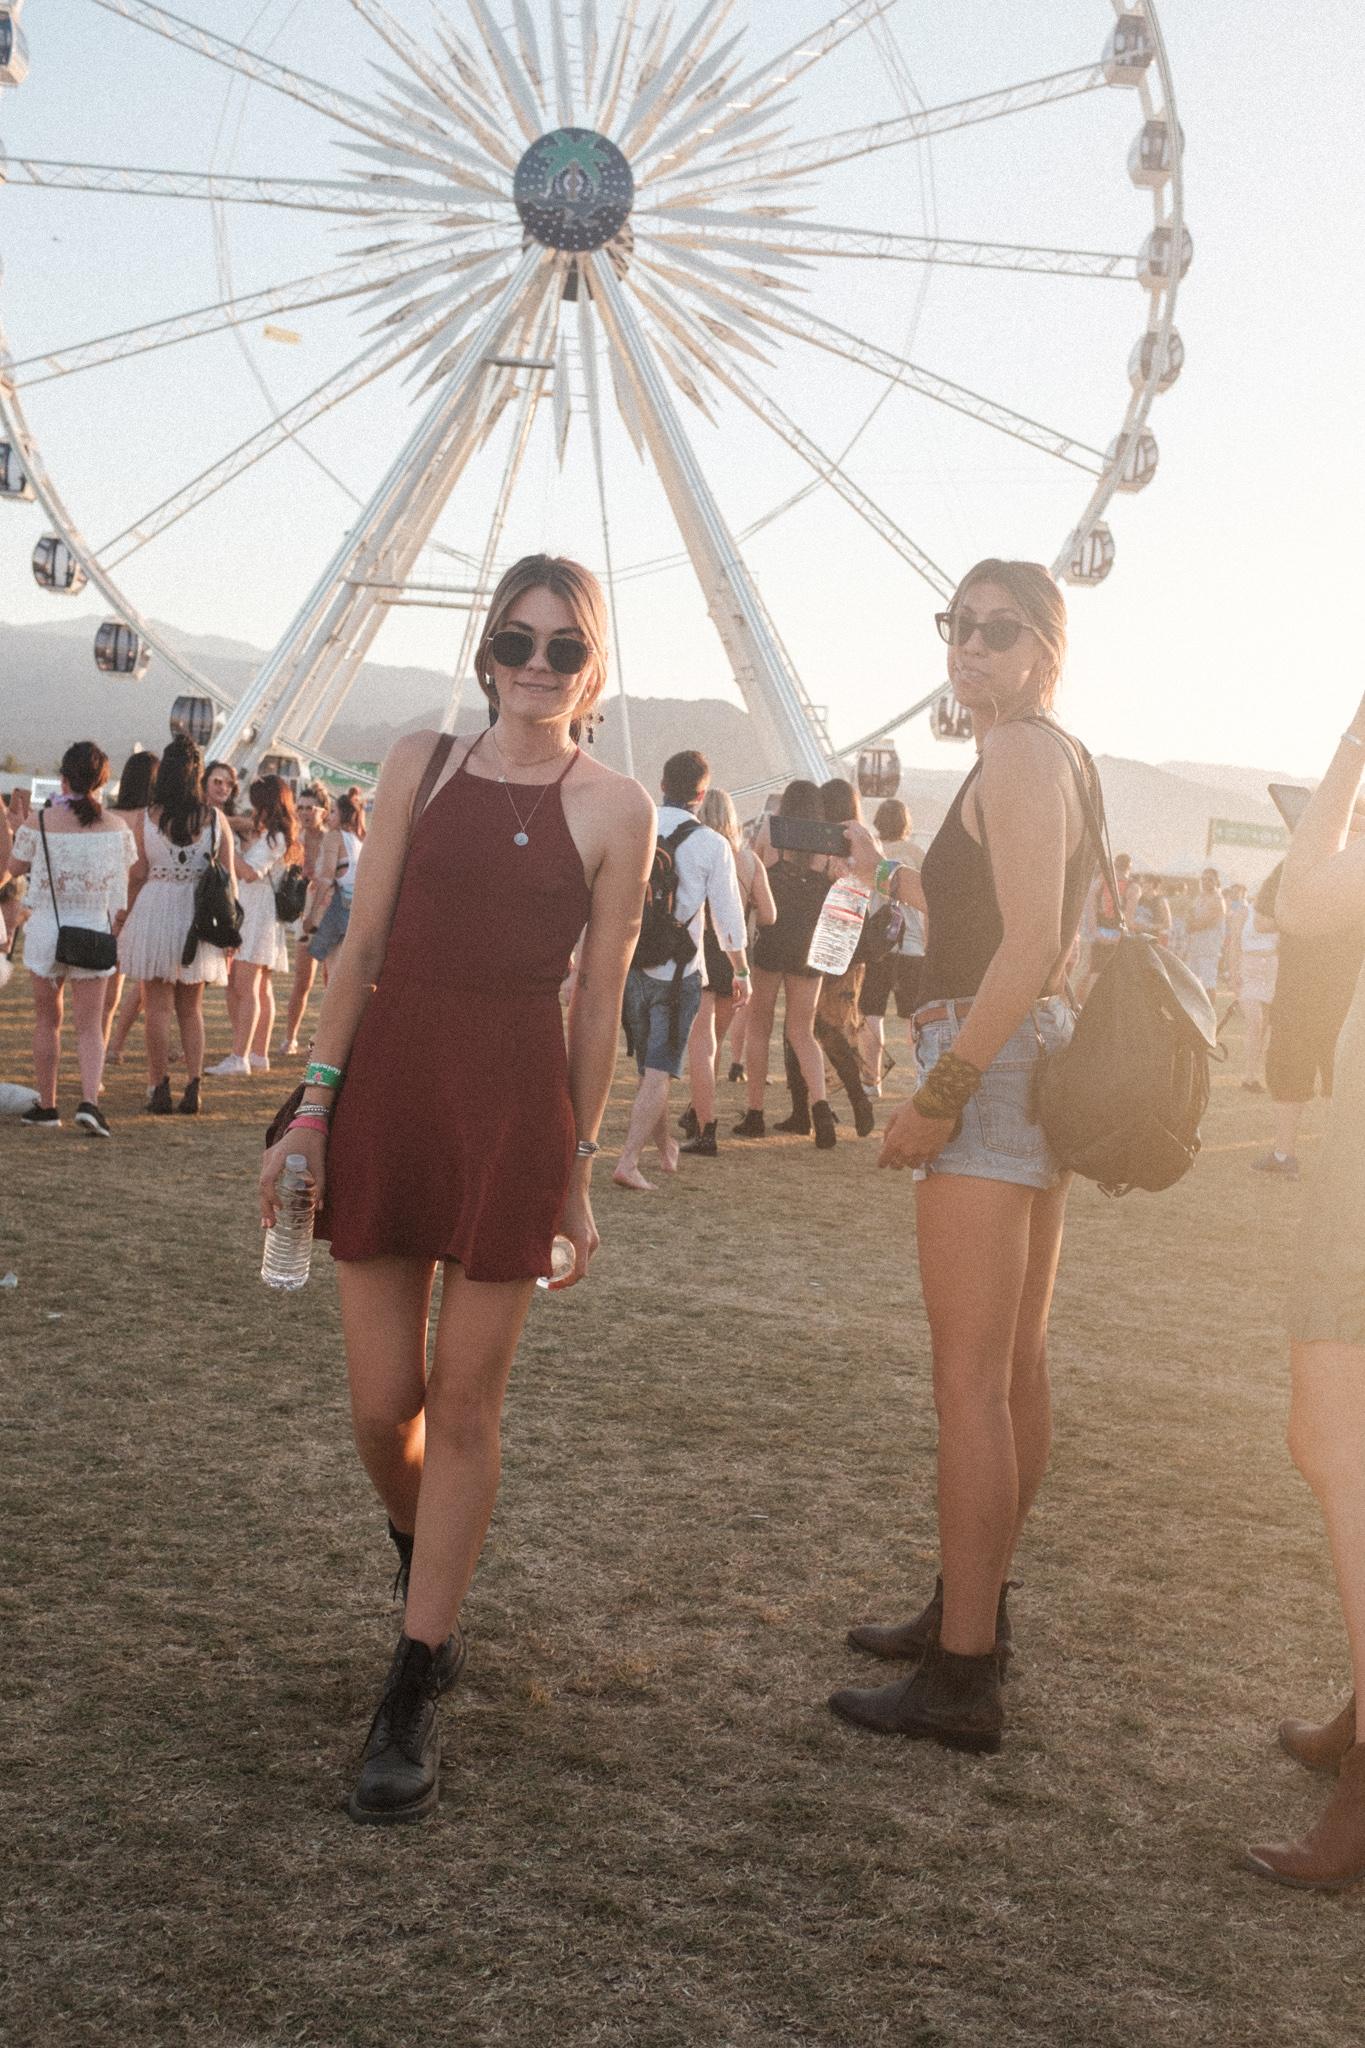 170422 Coachella 17 w2 1865.jpg